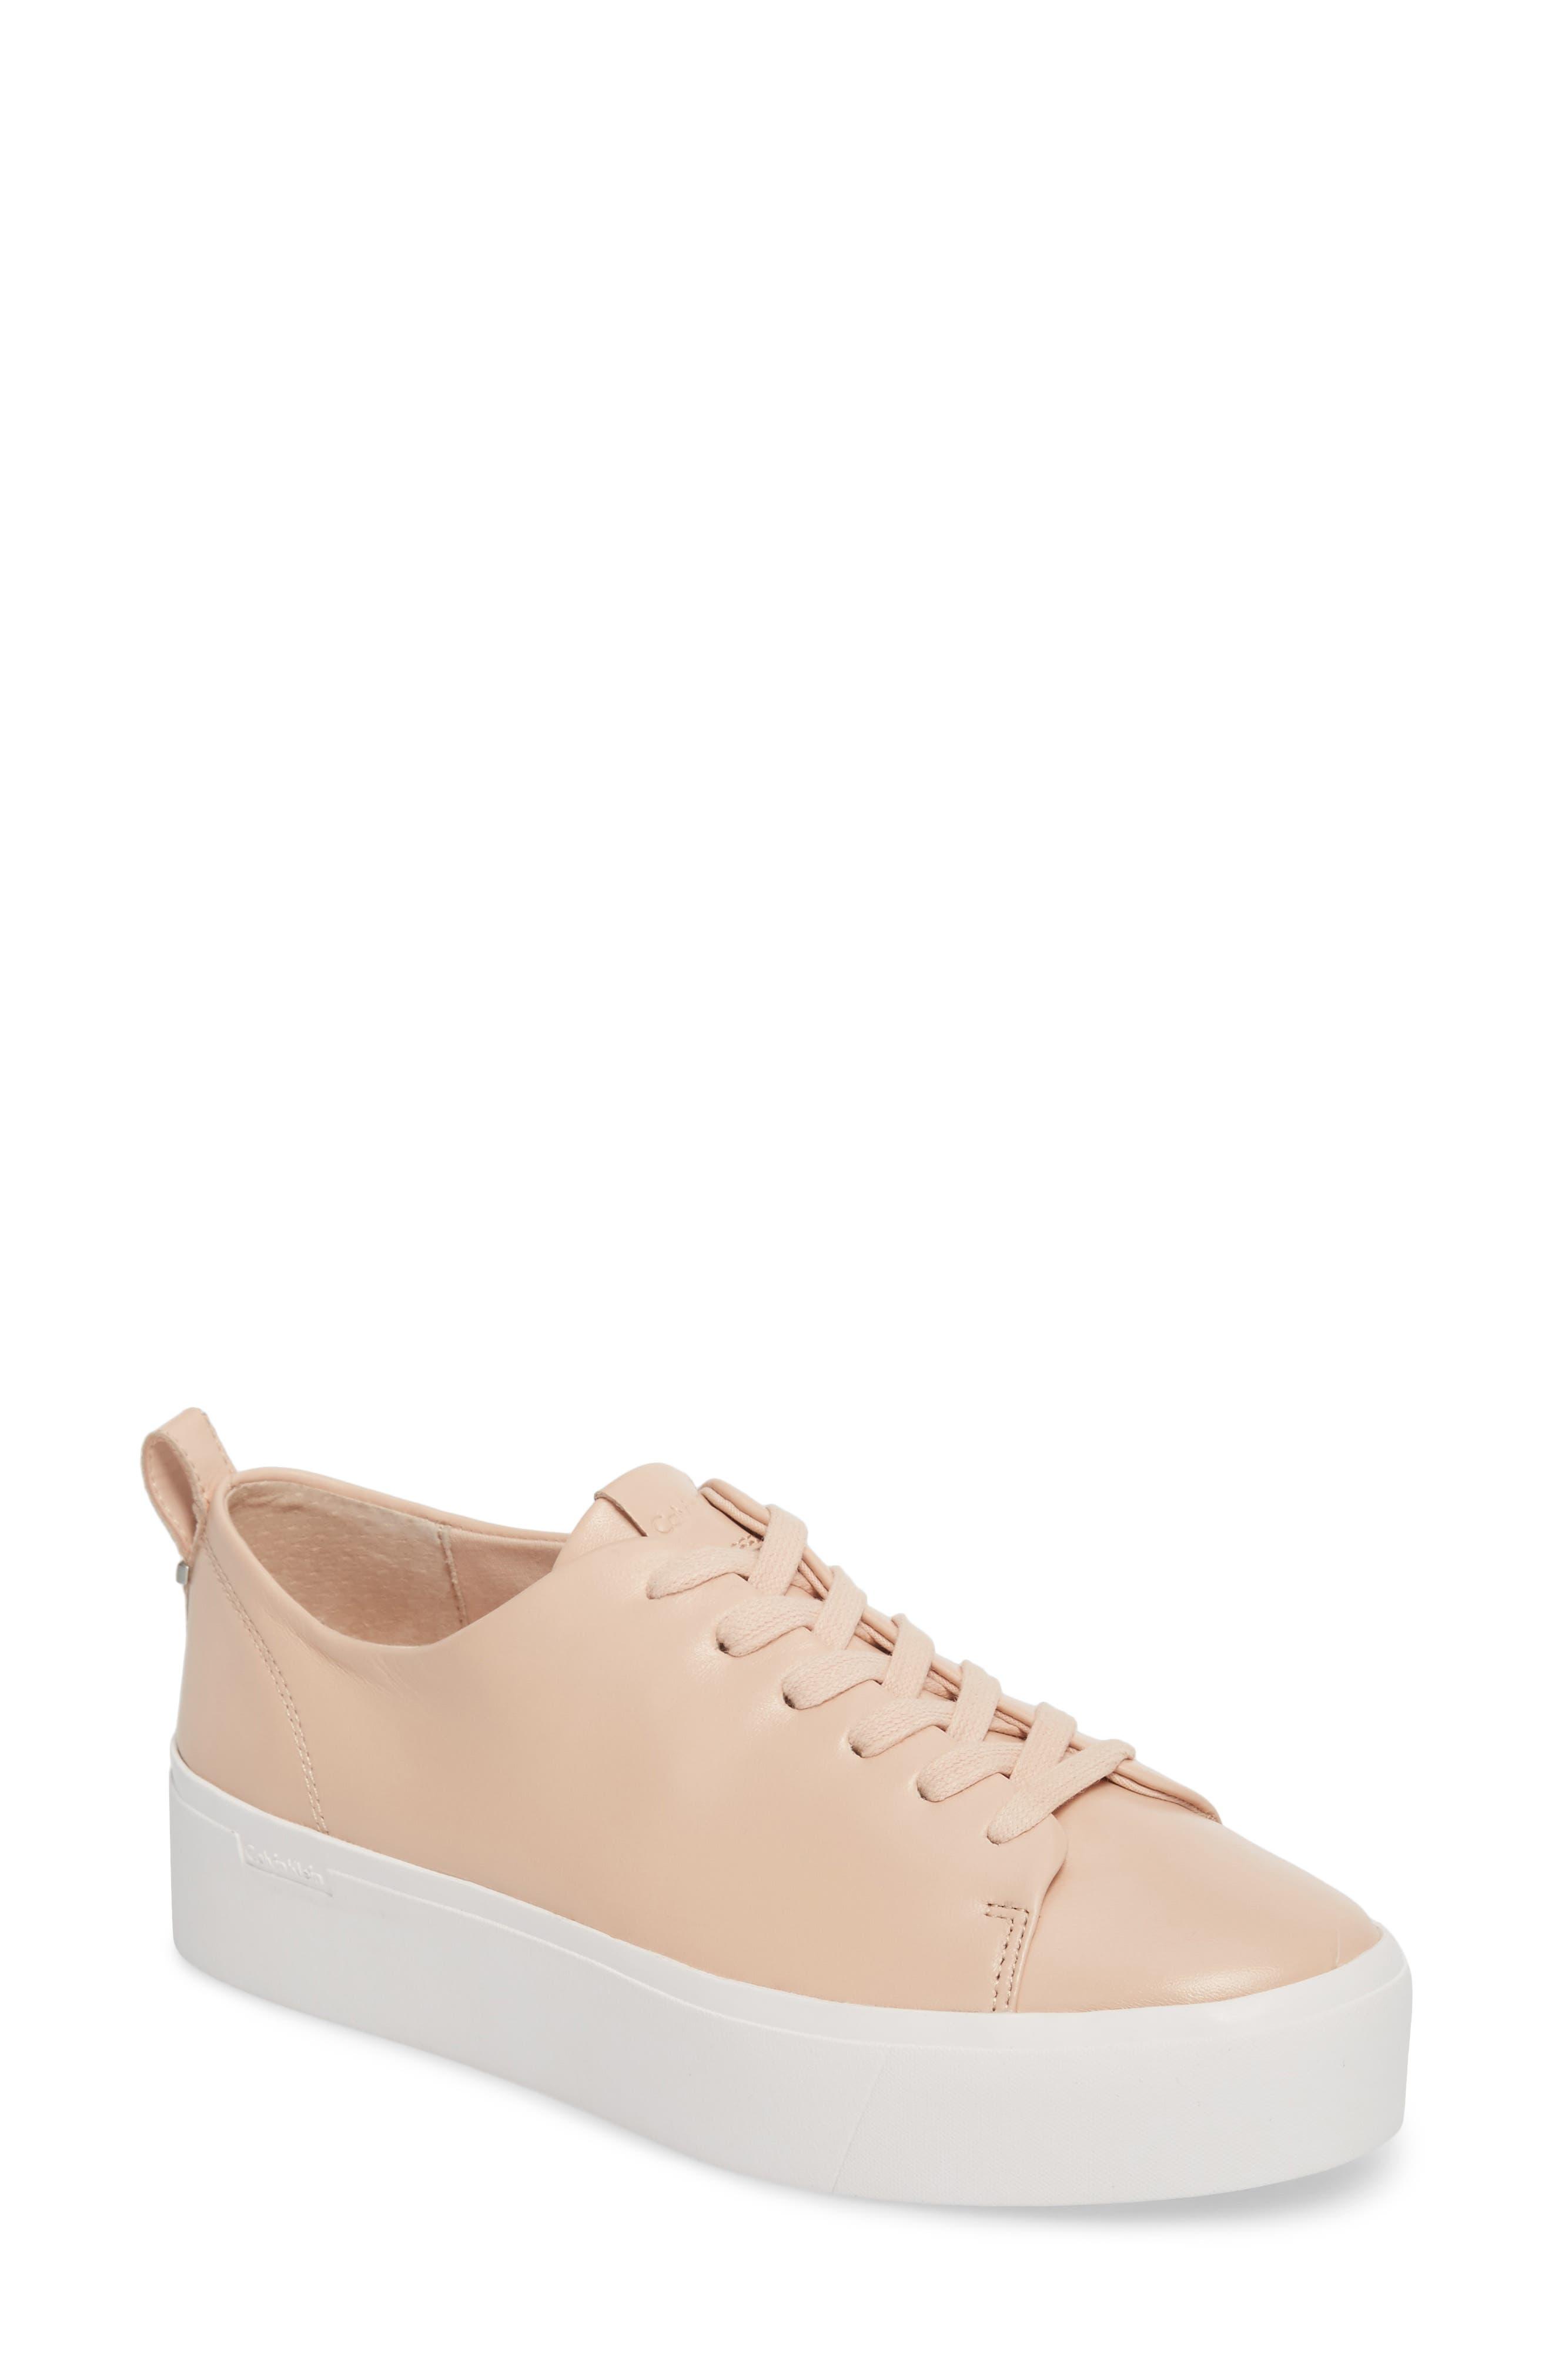 Janet Platform Sneaker,                             Main thumbnail 1, color,                             Pink Leather